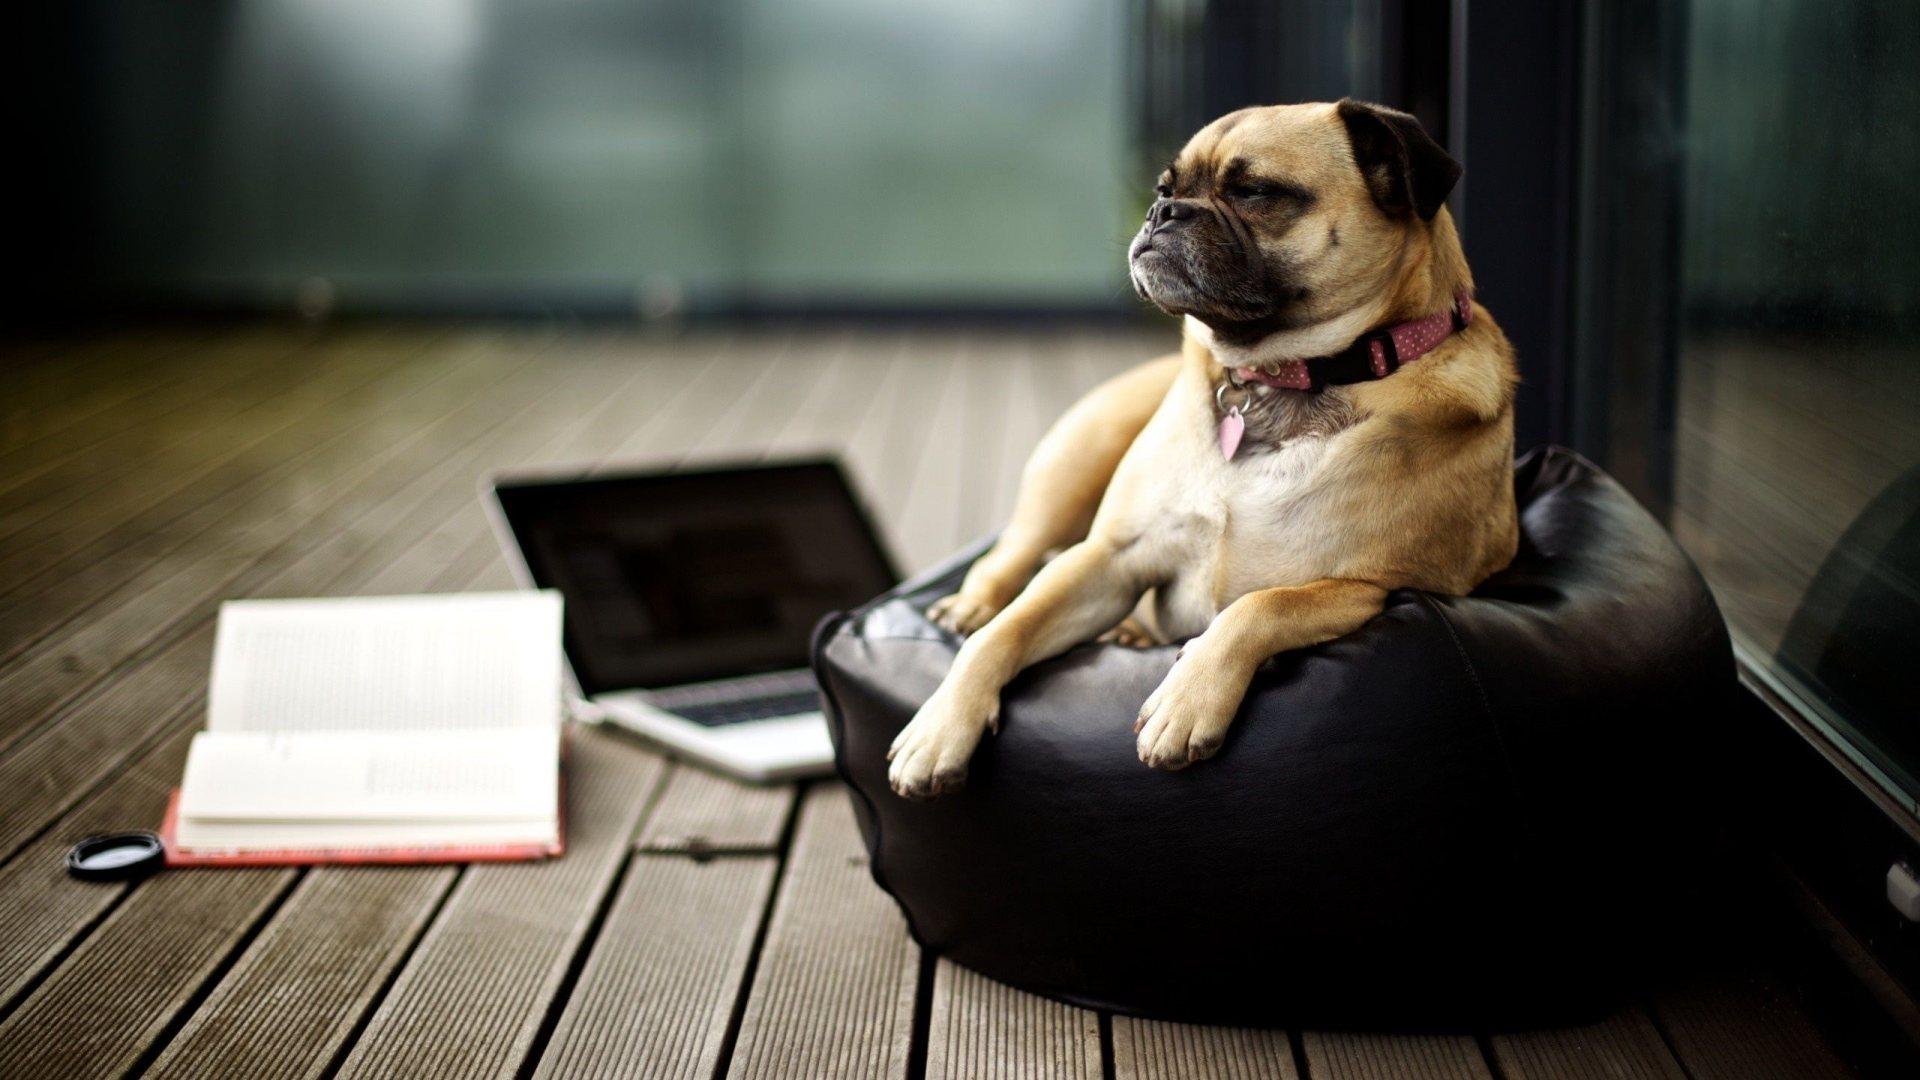 Business Dog Full HD Desktop Wallpapers 1080p 1920x1080